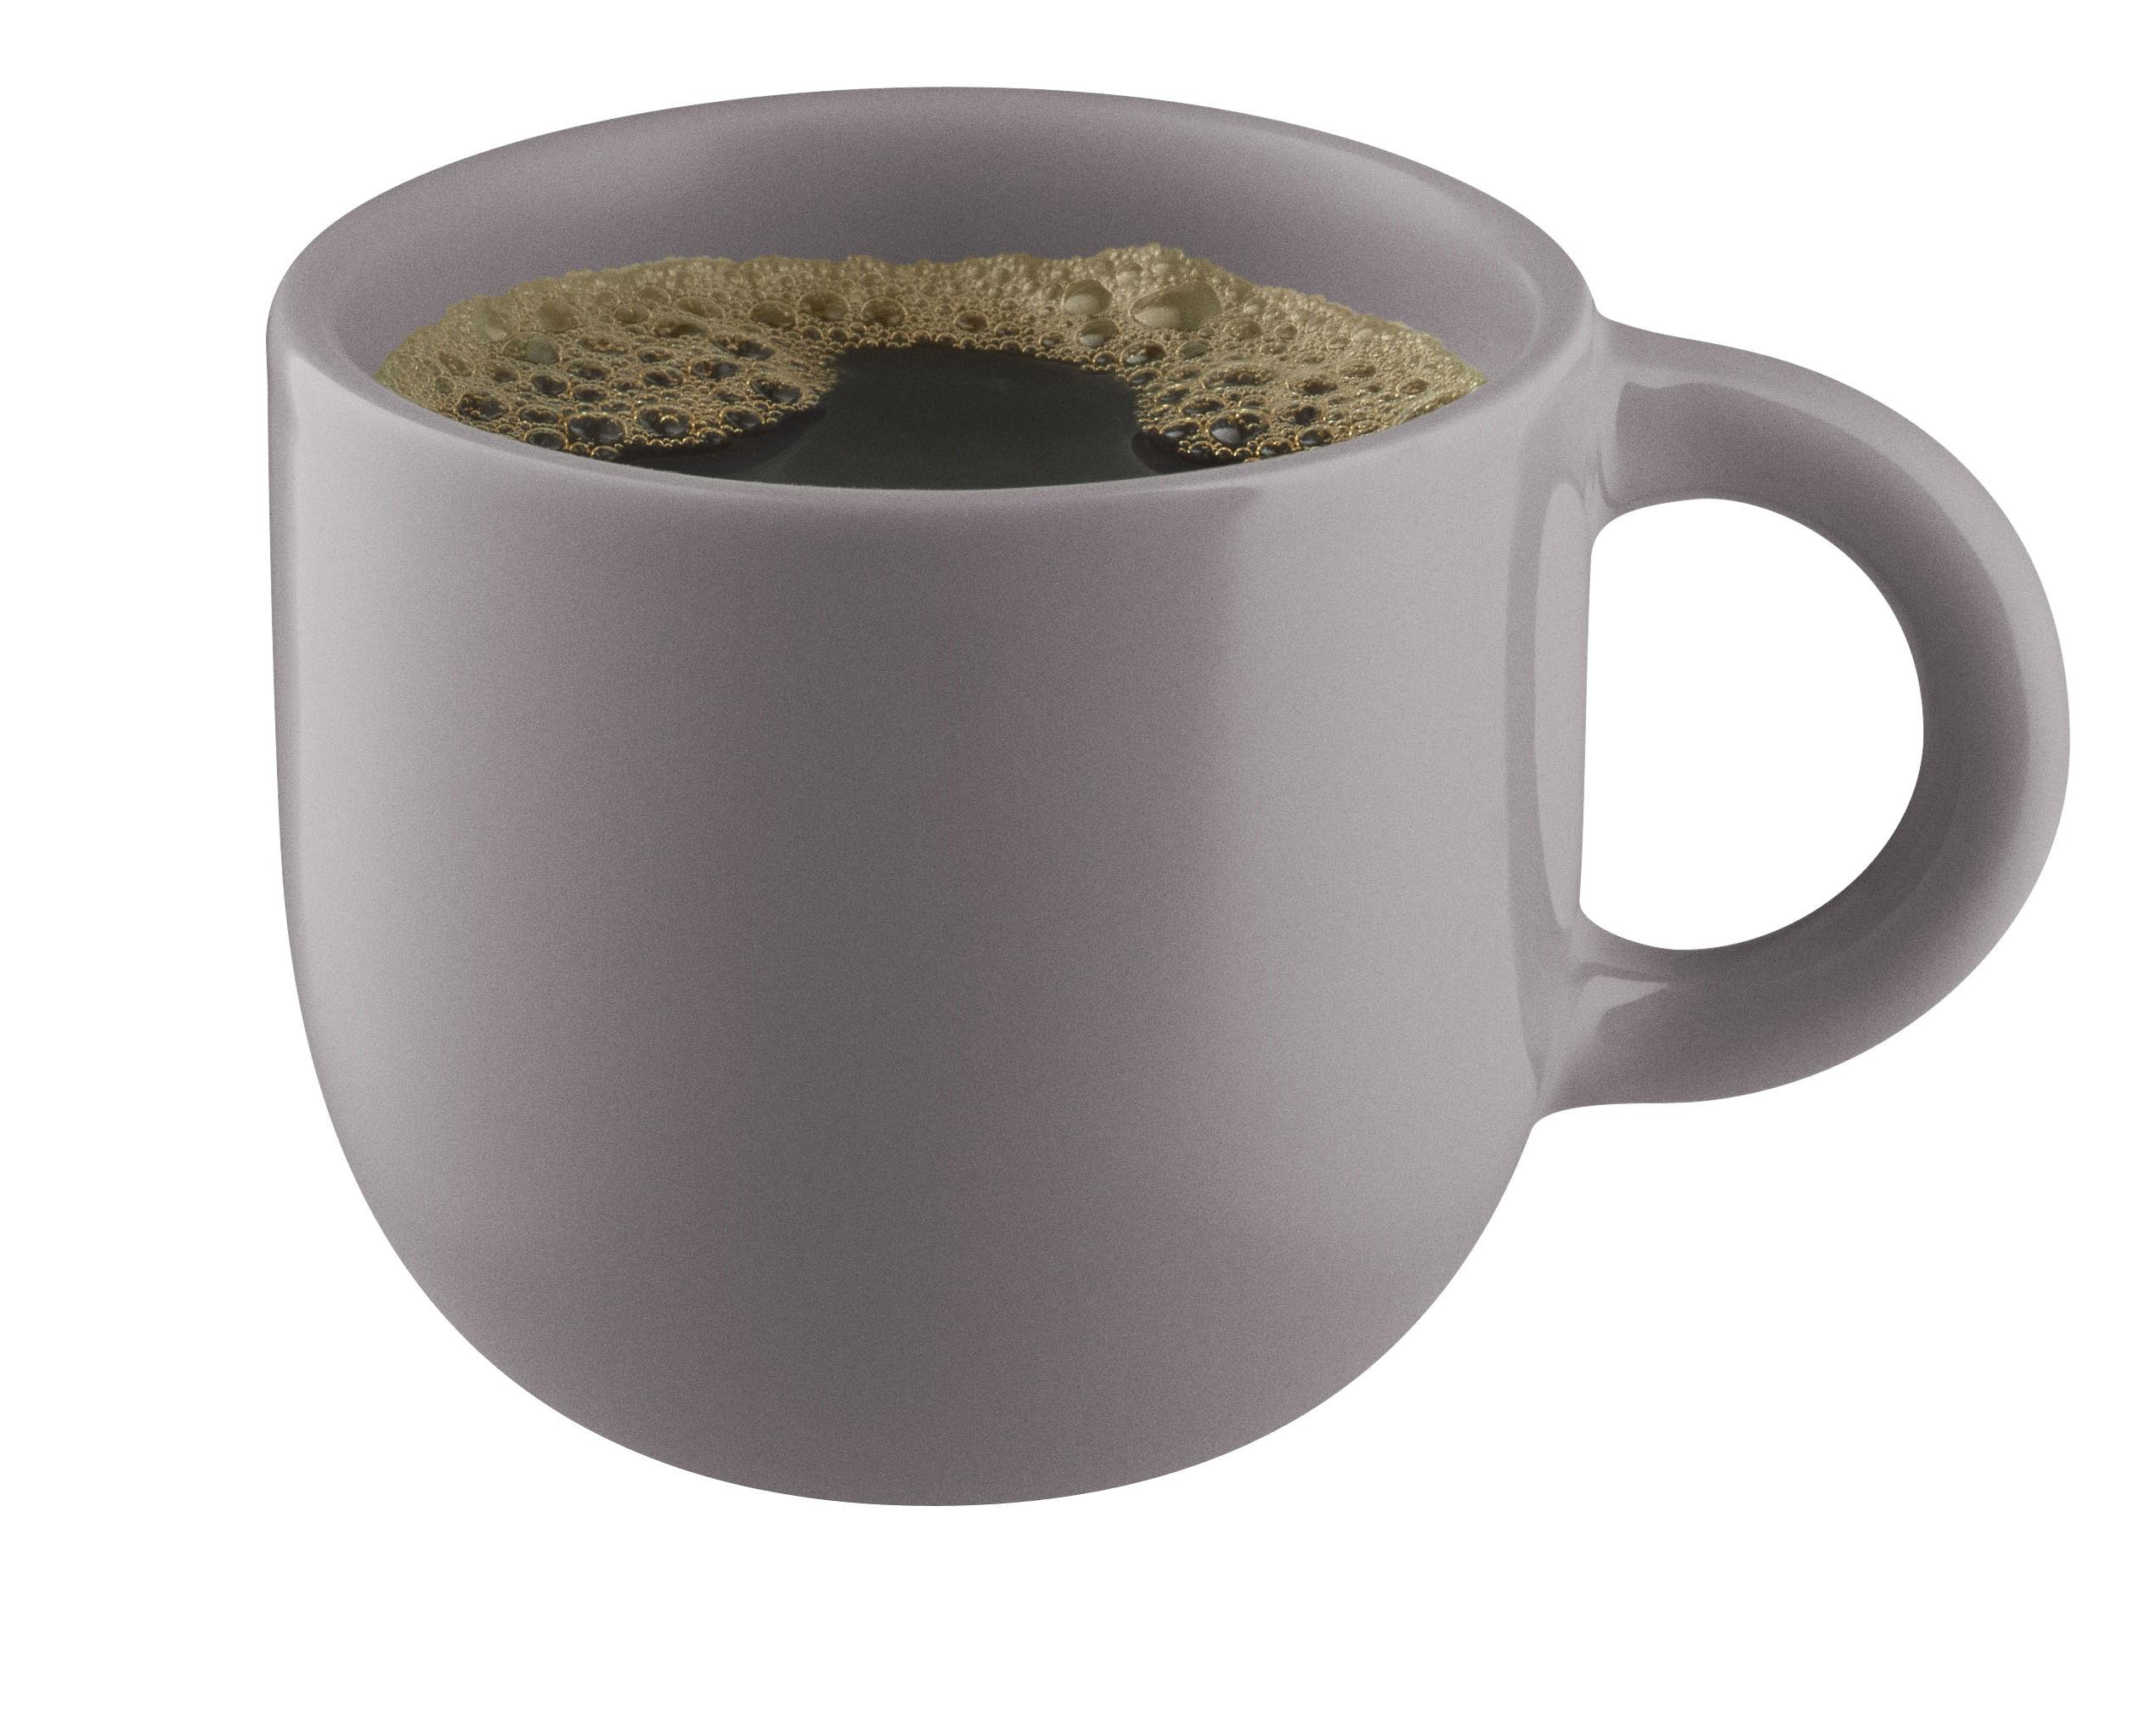 Tableware - Coffee Mugs & Tea Cups - Globe Teacup - Stoneware by Eva Solo - Nordic Grey - Sandstone